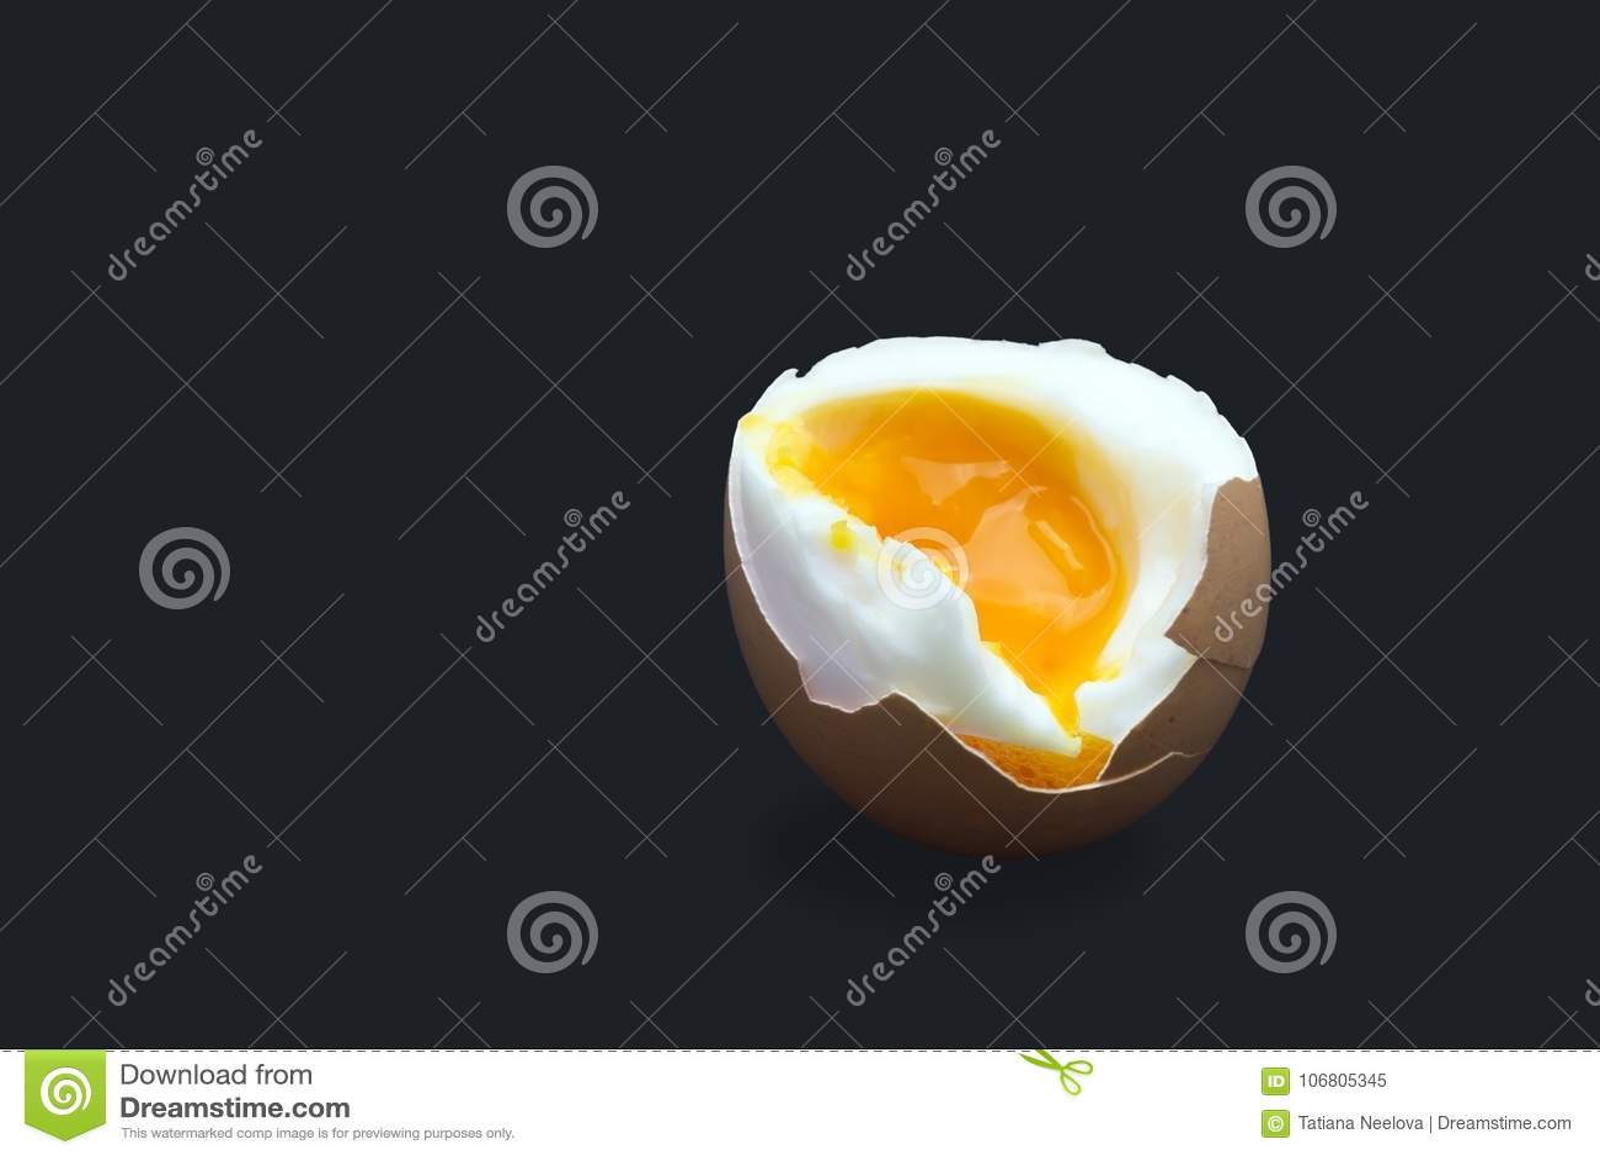 A photo of boiled smash broken hen beige egg isolated on dark blue. Egg`s liquid yolk photo, bright contrast.